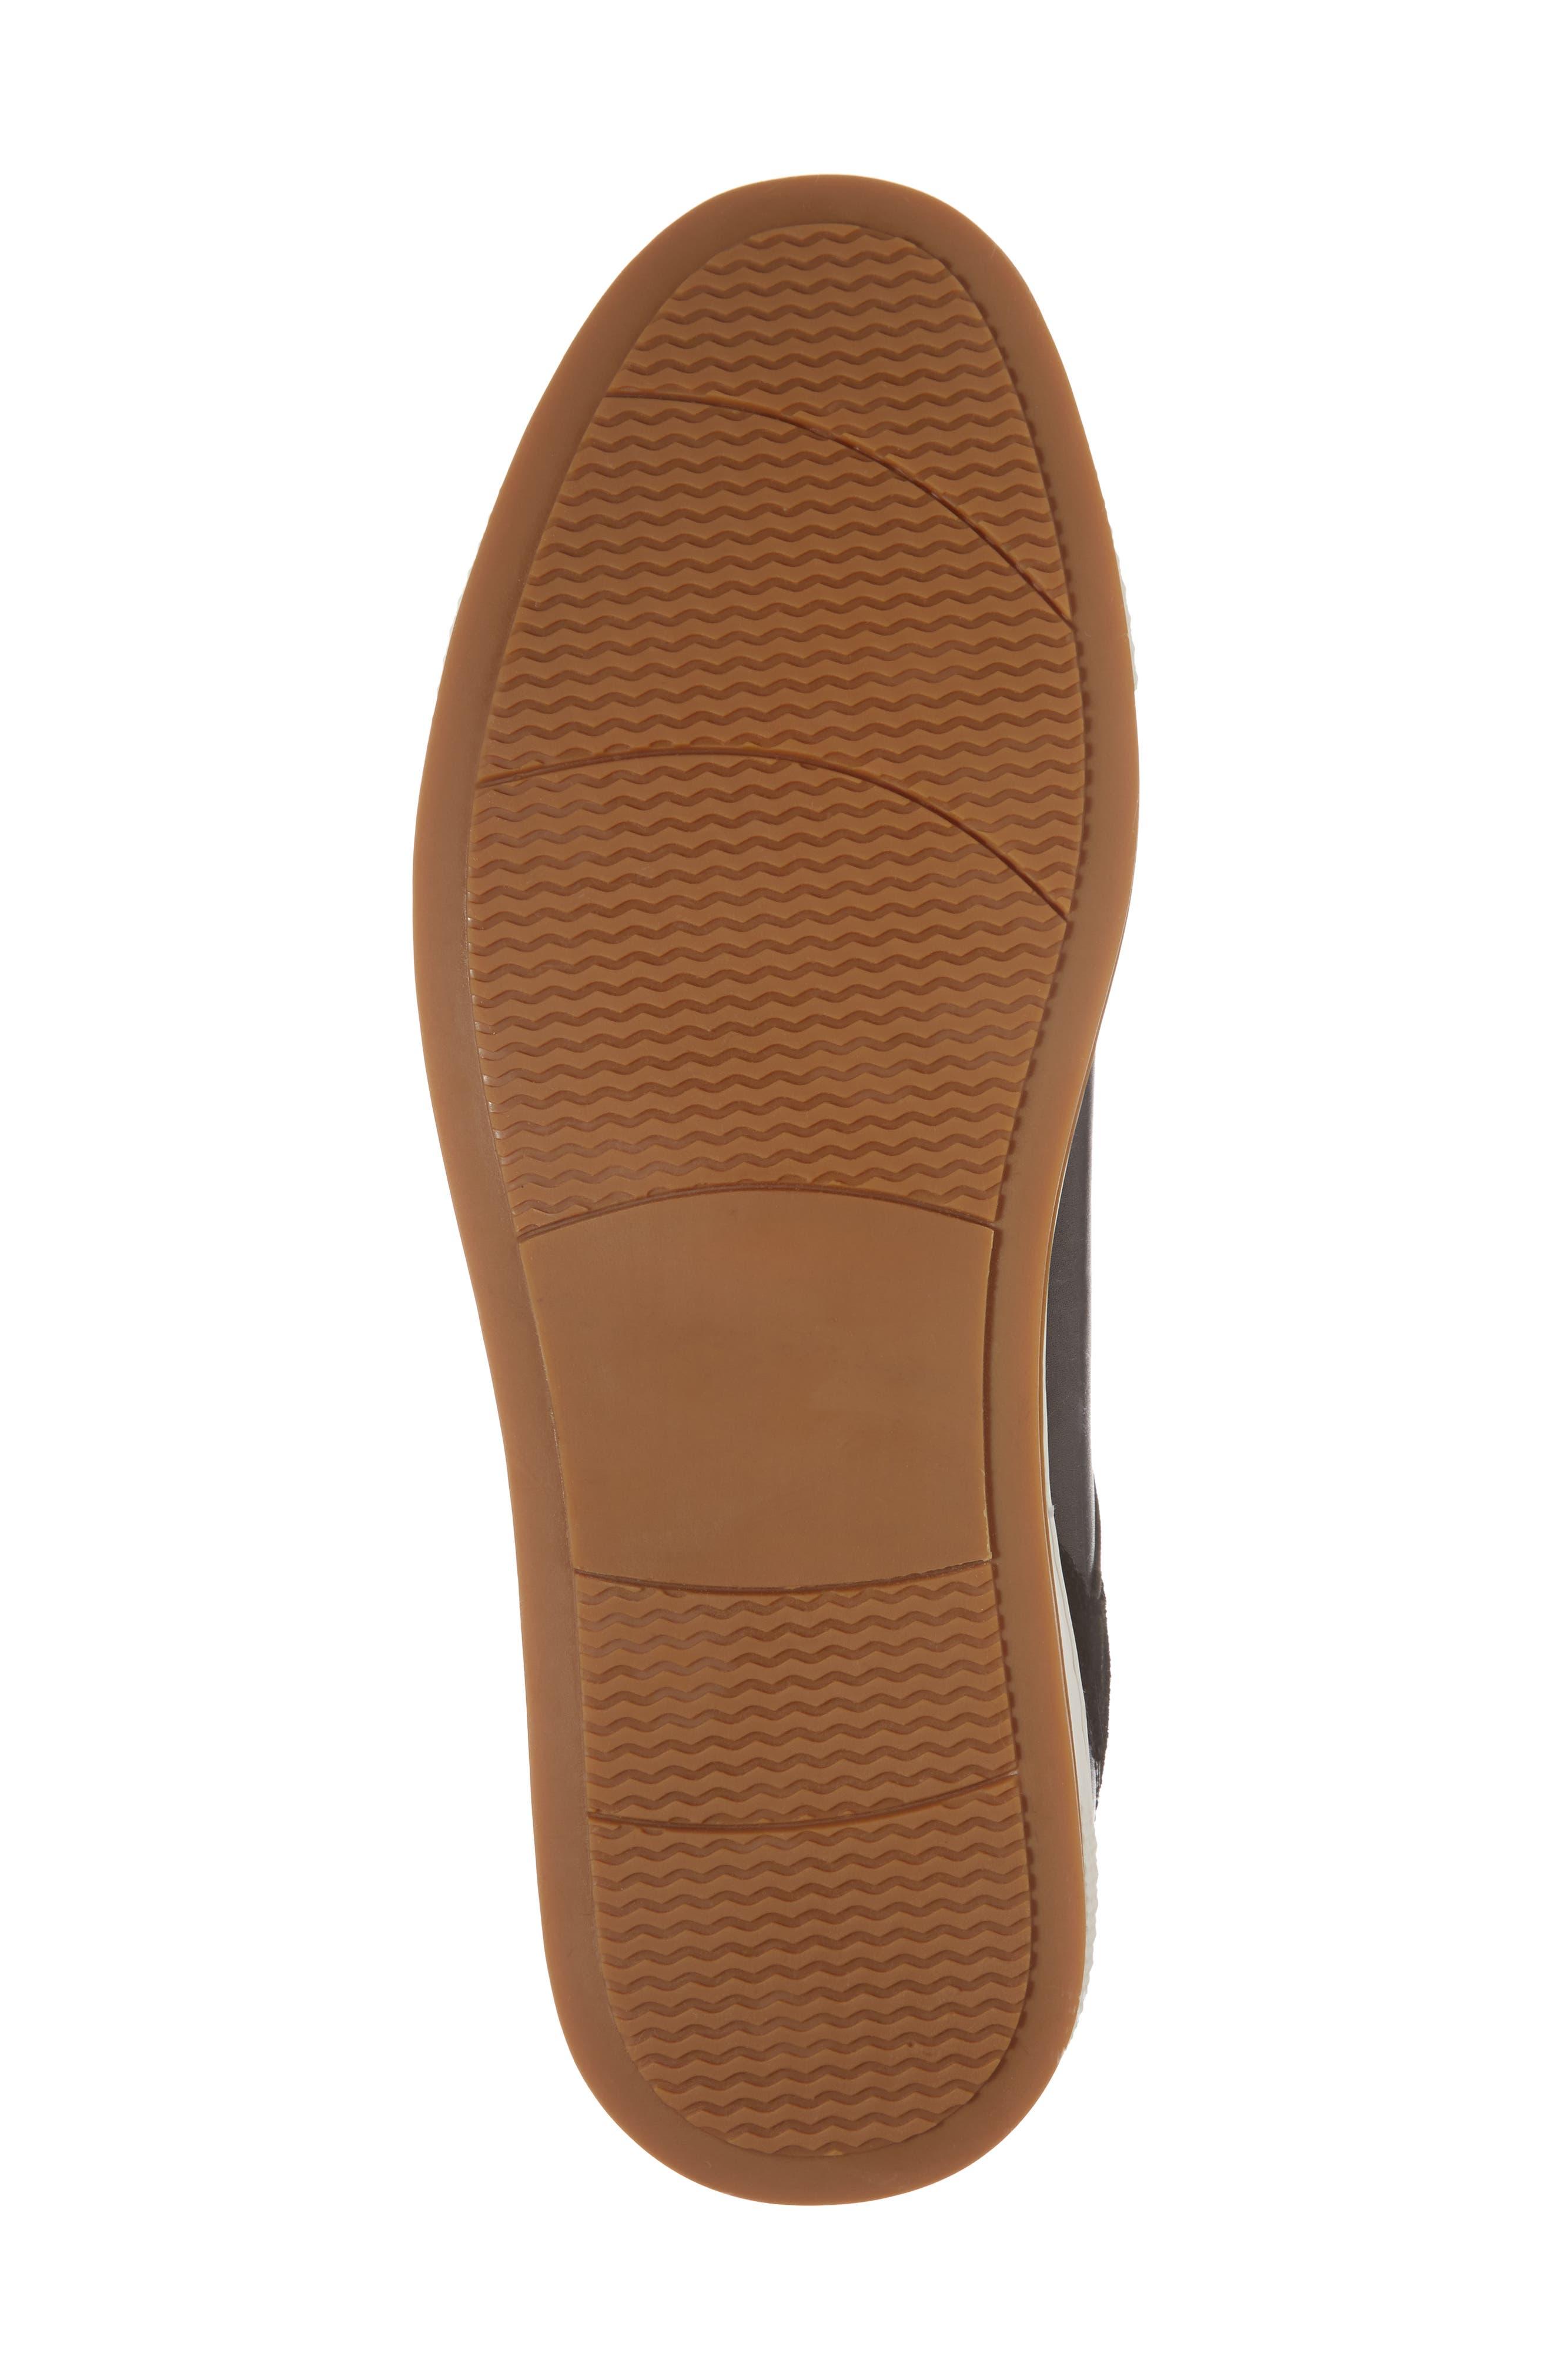 Ireton Low Top Sneaker,                             Alternate thumbnail 6, color,                             BLACK LEATHER/ SUEDE